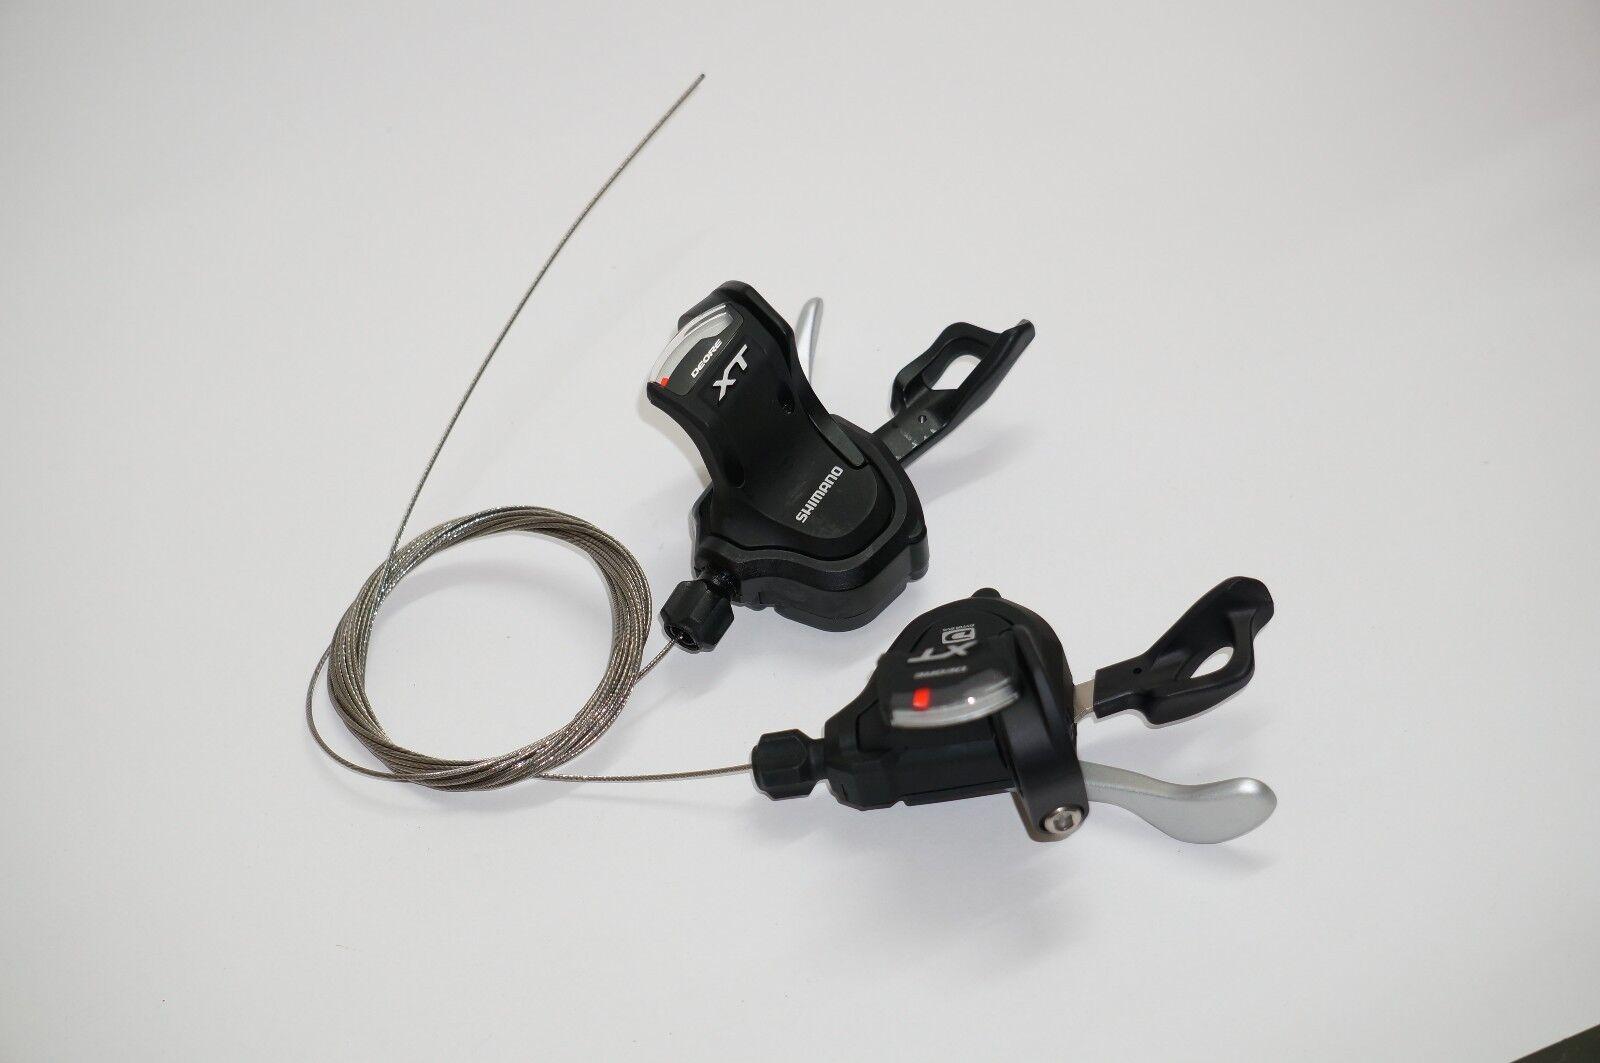 Neue Shimano XT Shifter SL -M780 - Dyna Sys 10 Speed Shifter